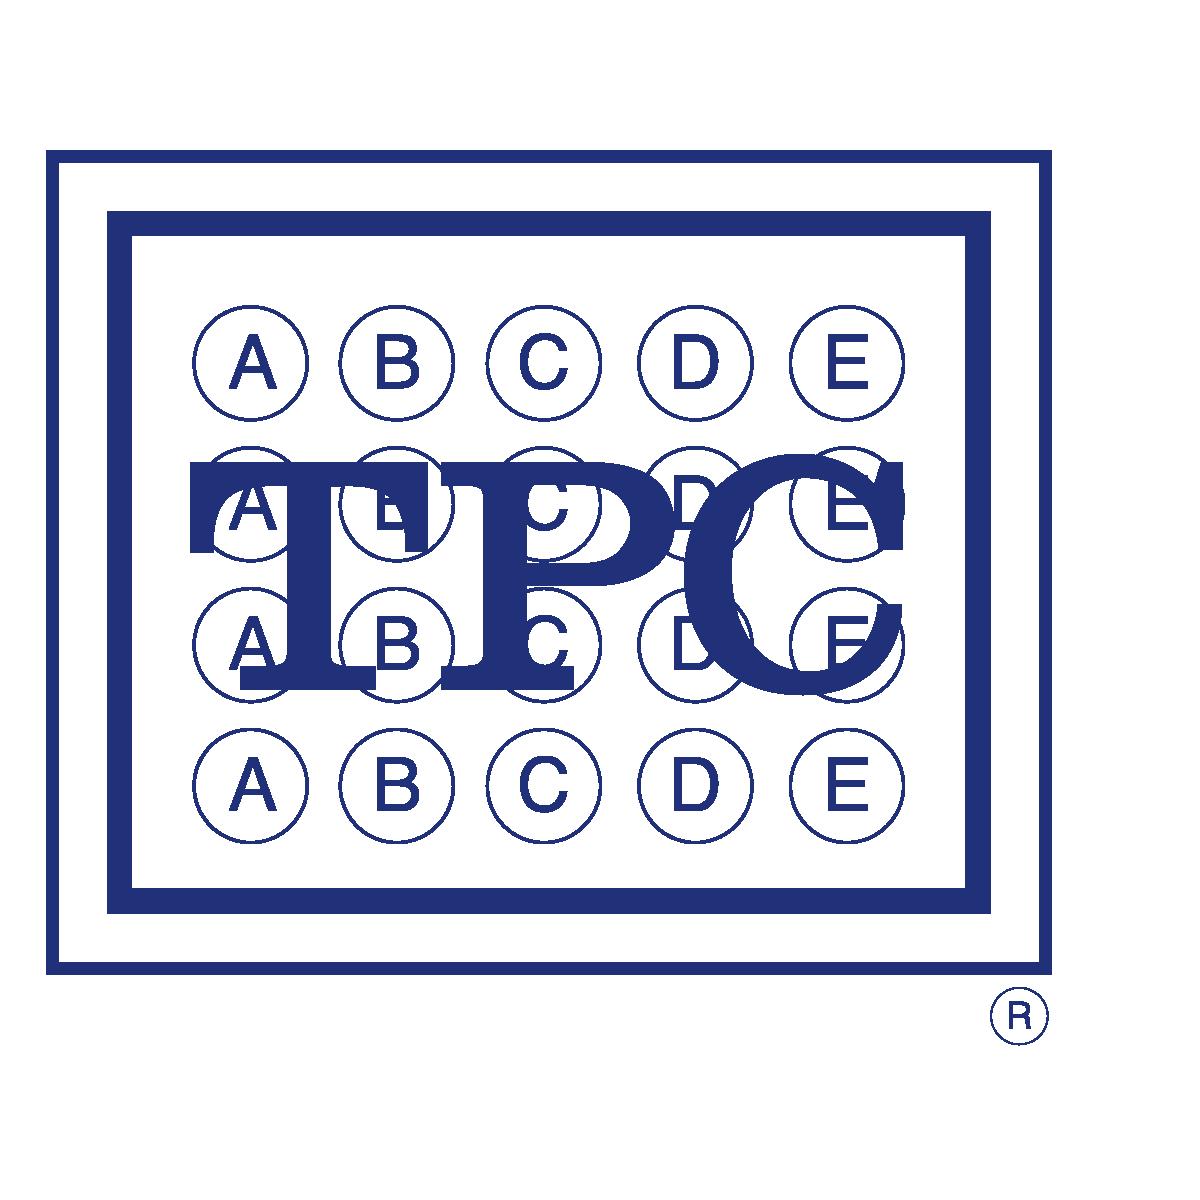 High School Entrance Exam Testing - Test Prep Chicago [ 1200 x 1200 Pixel ]